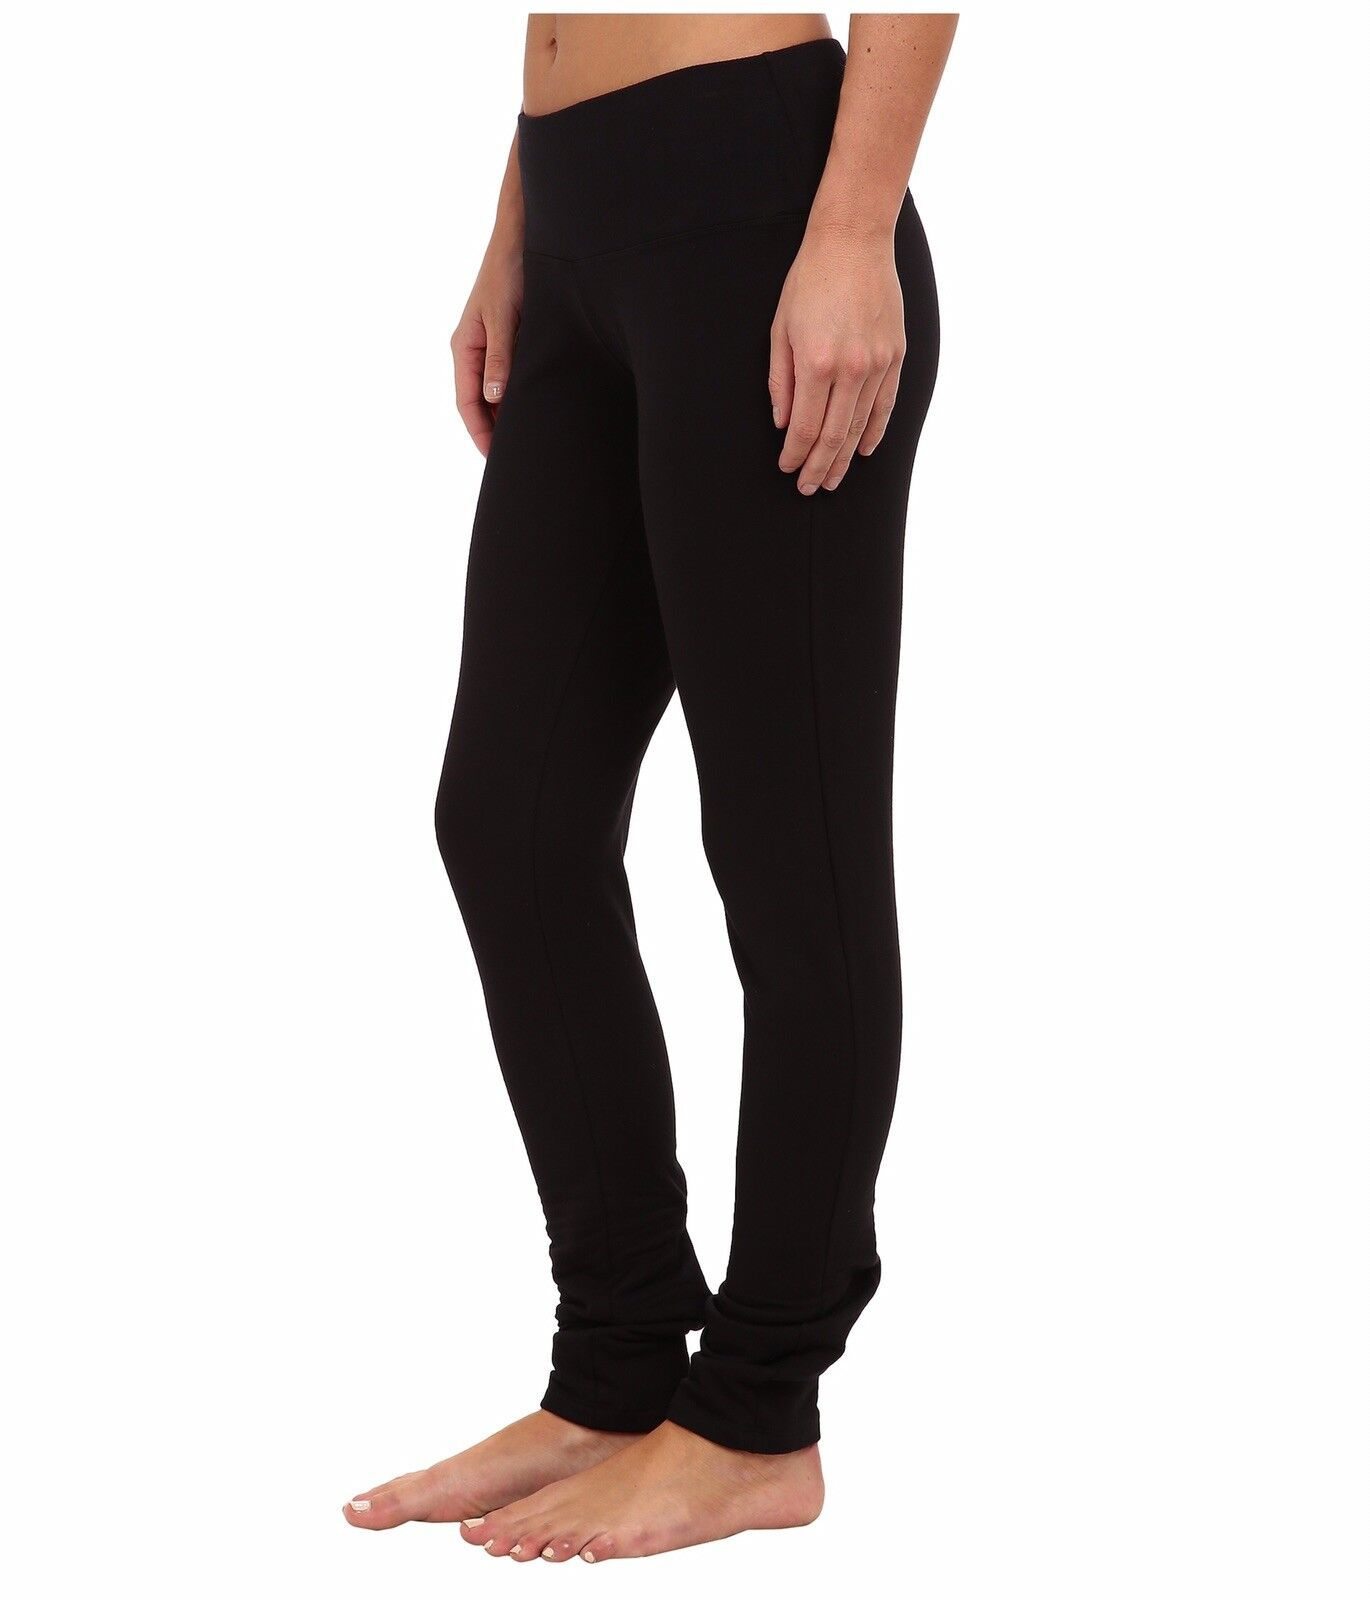 NWT Fig Clothing Legging Cozy Stretch Pant Organic Cotton Fleece Legging MD